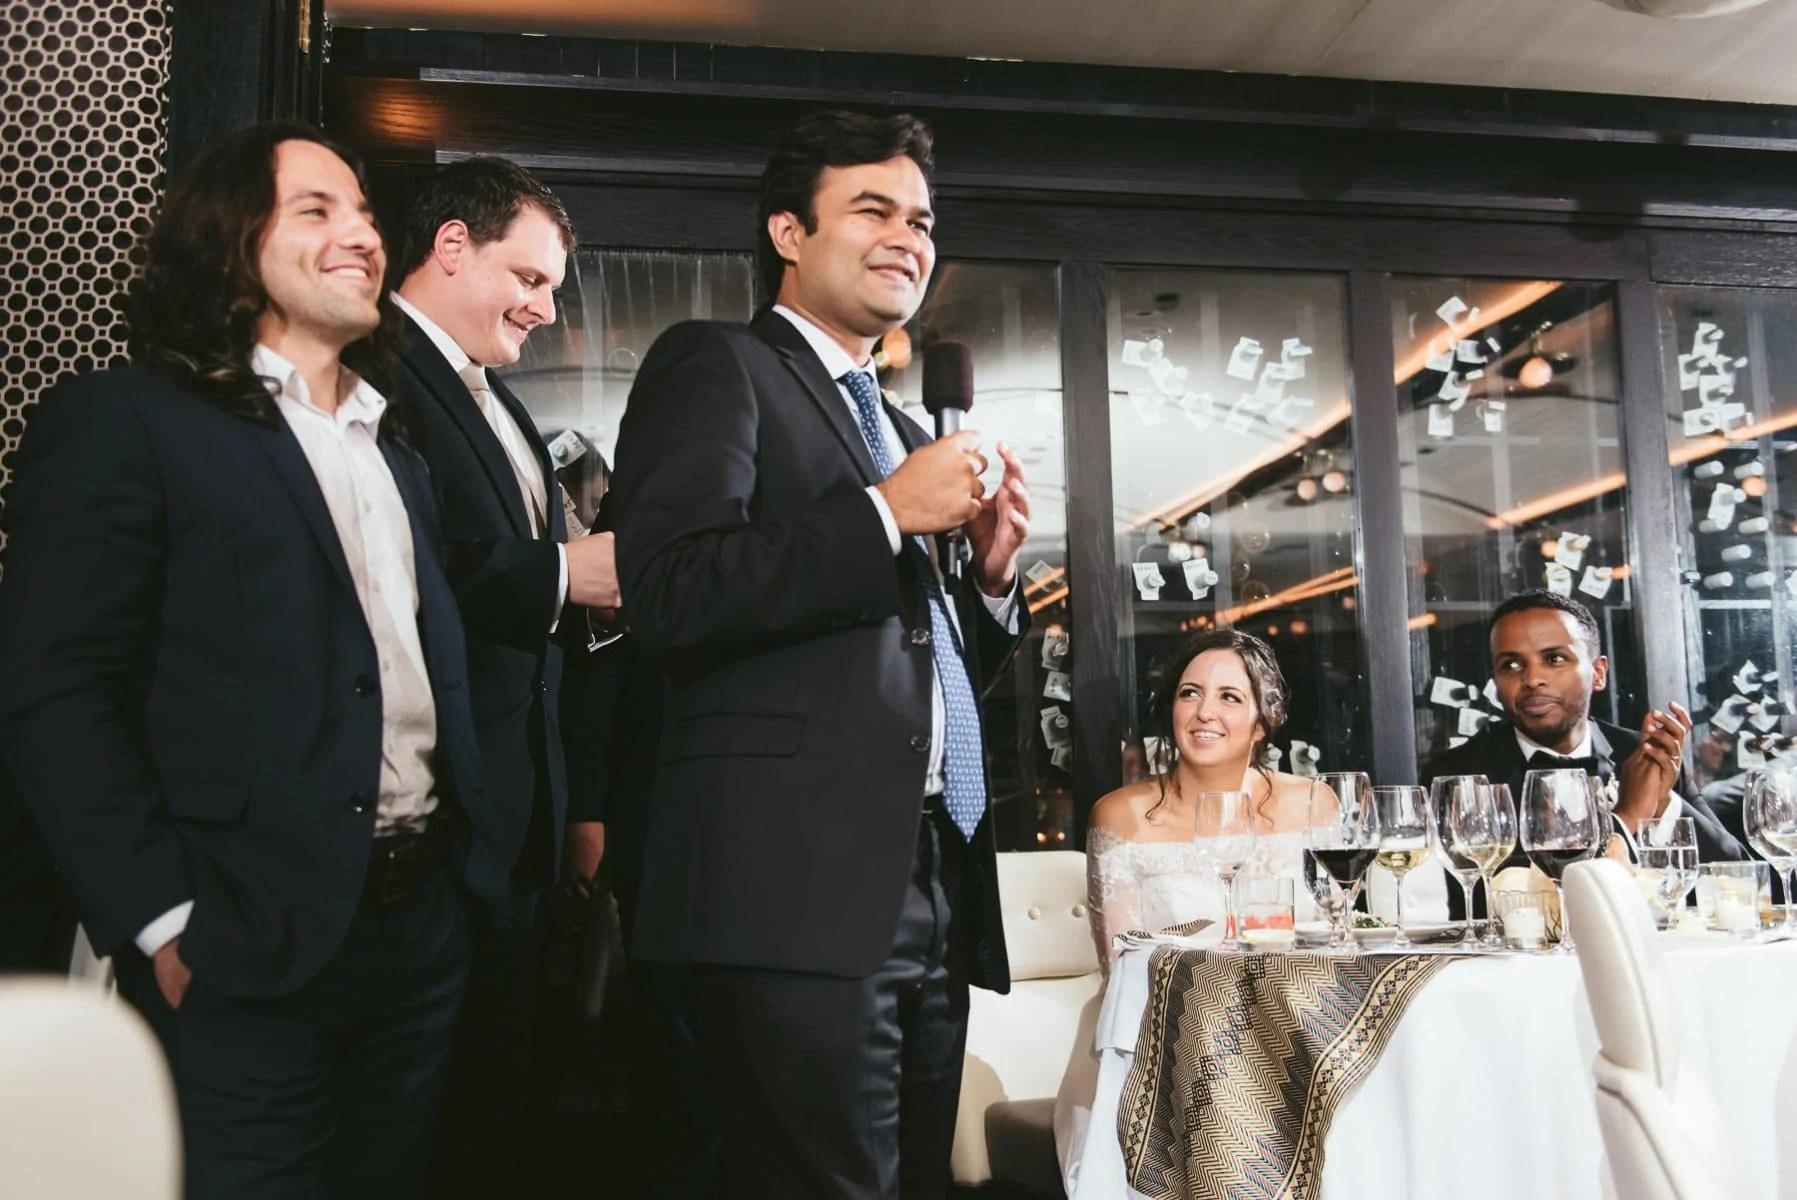 Del posto Restaurant wedding - Manhattan wedding